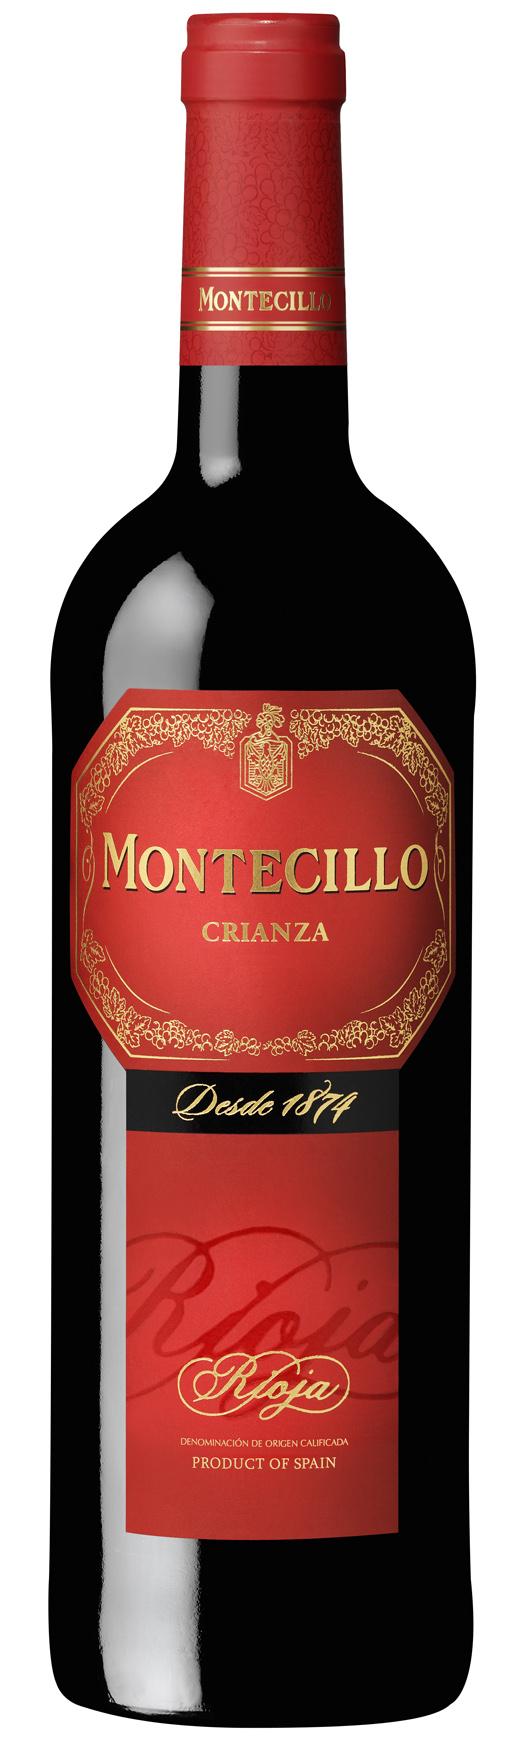 MontecilloCrianza(MR)